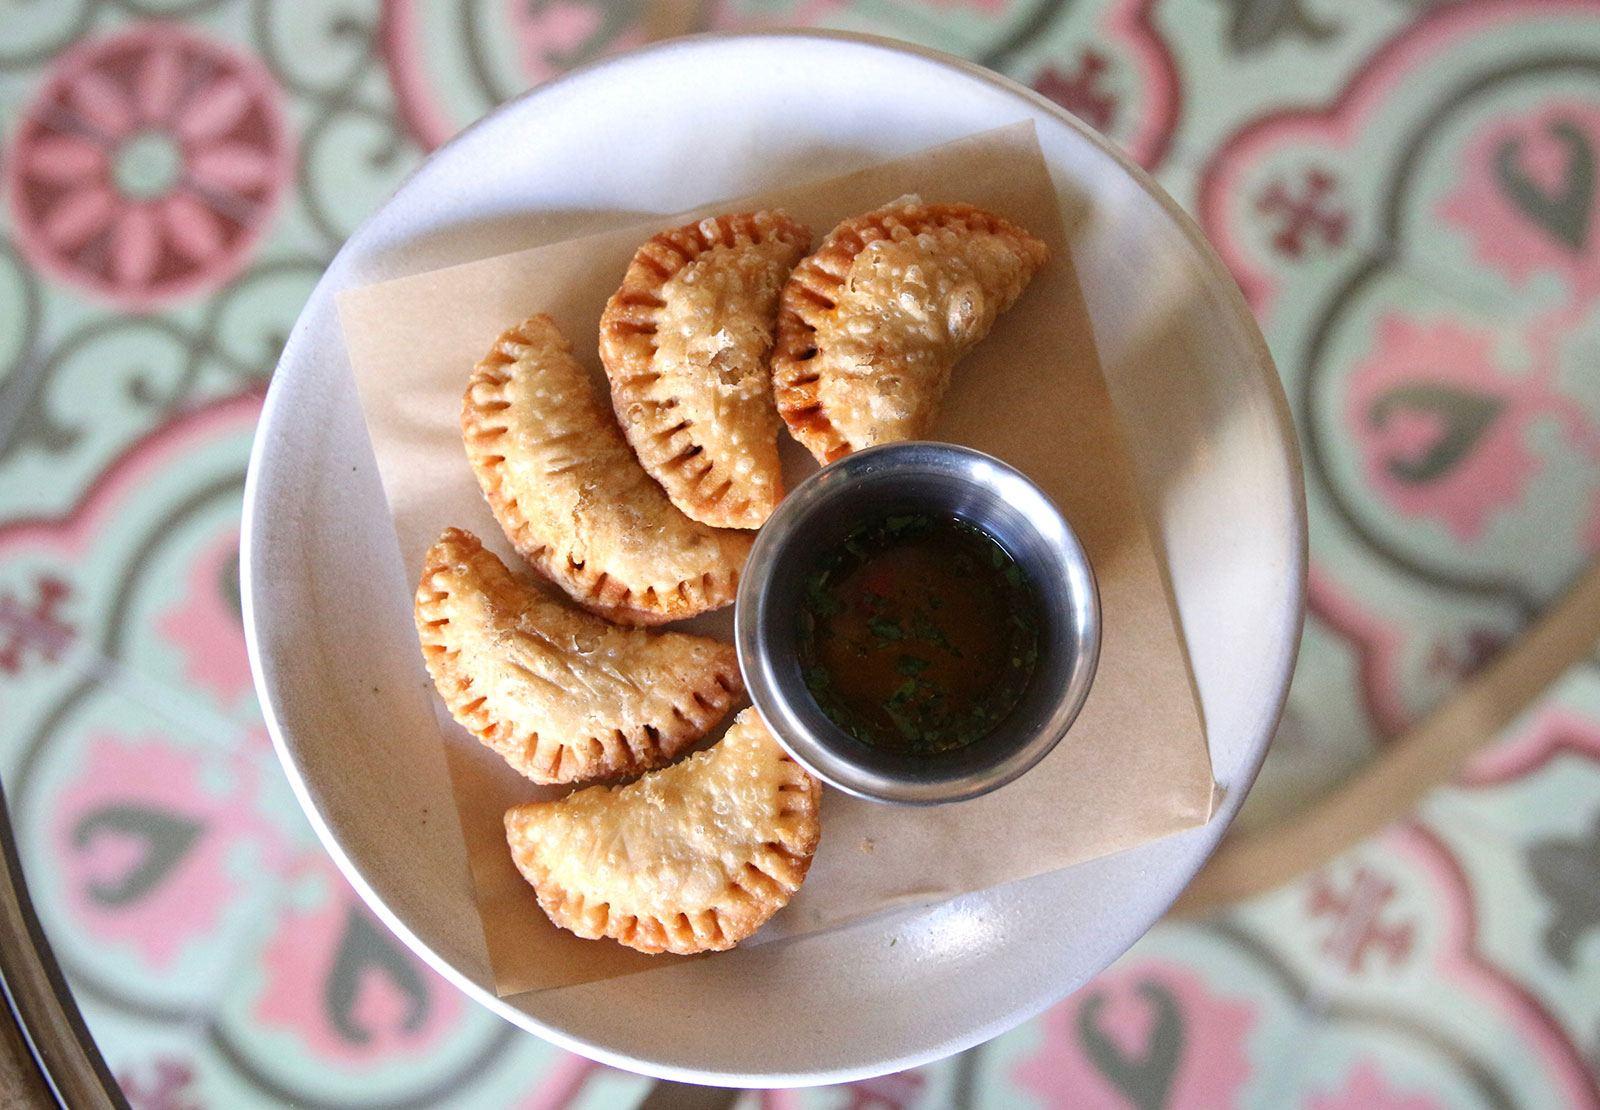 4 Empenadas on a plate